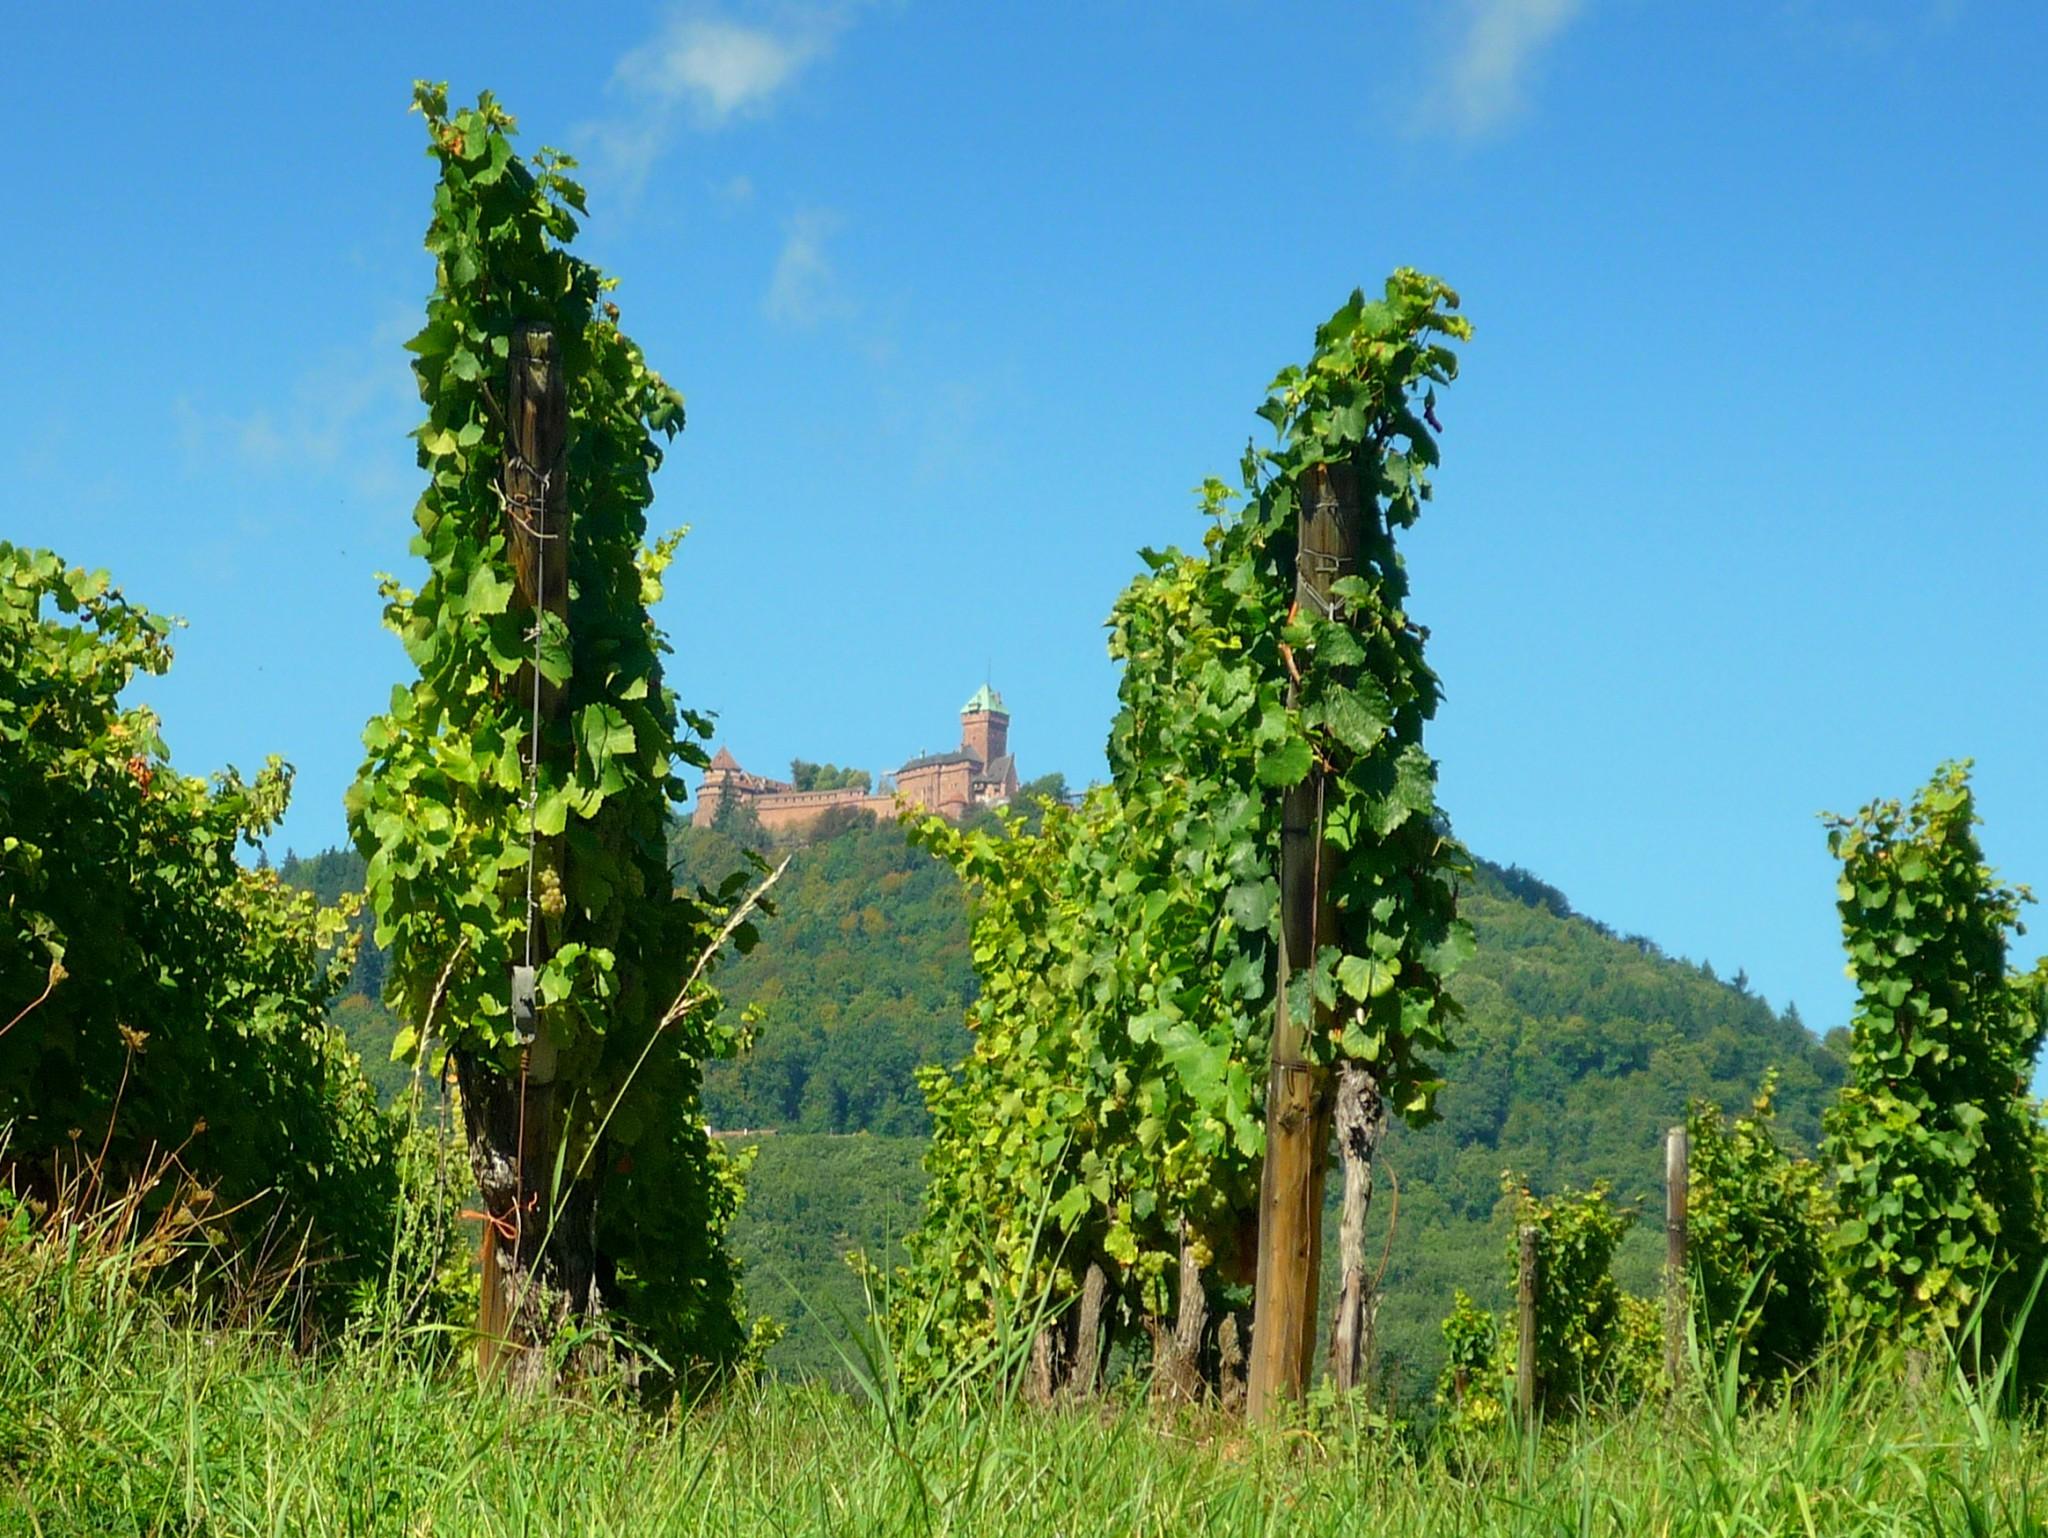 Alsace Wine Route - Haut-Kœnigsbourg © French Moments